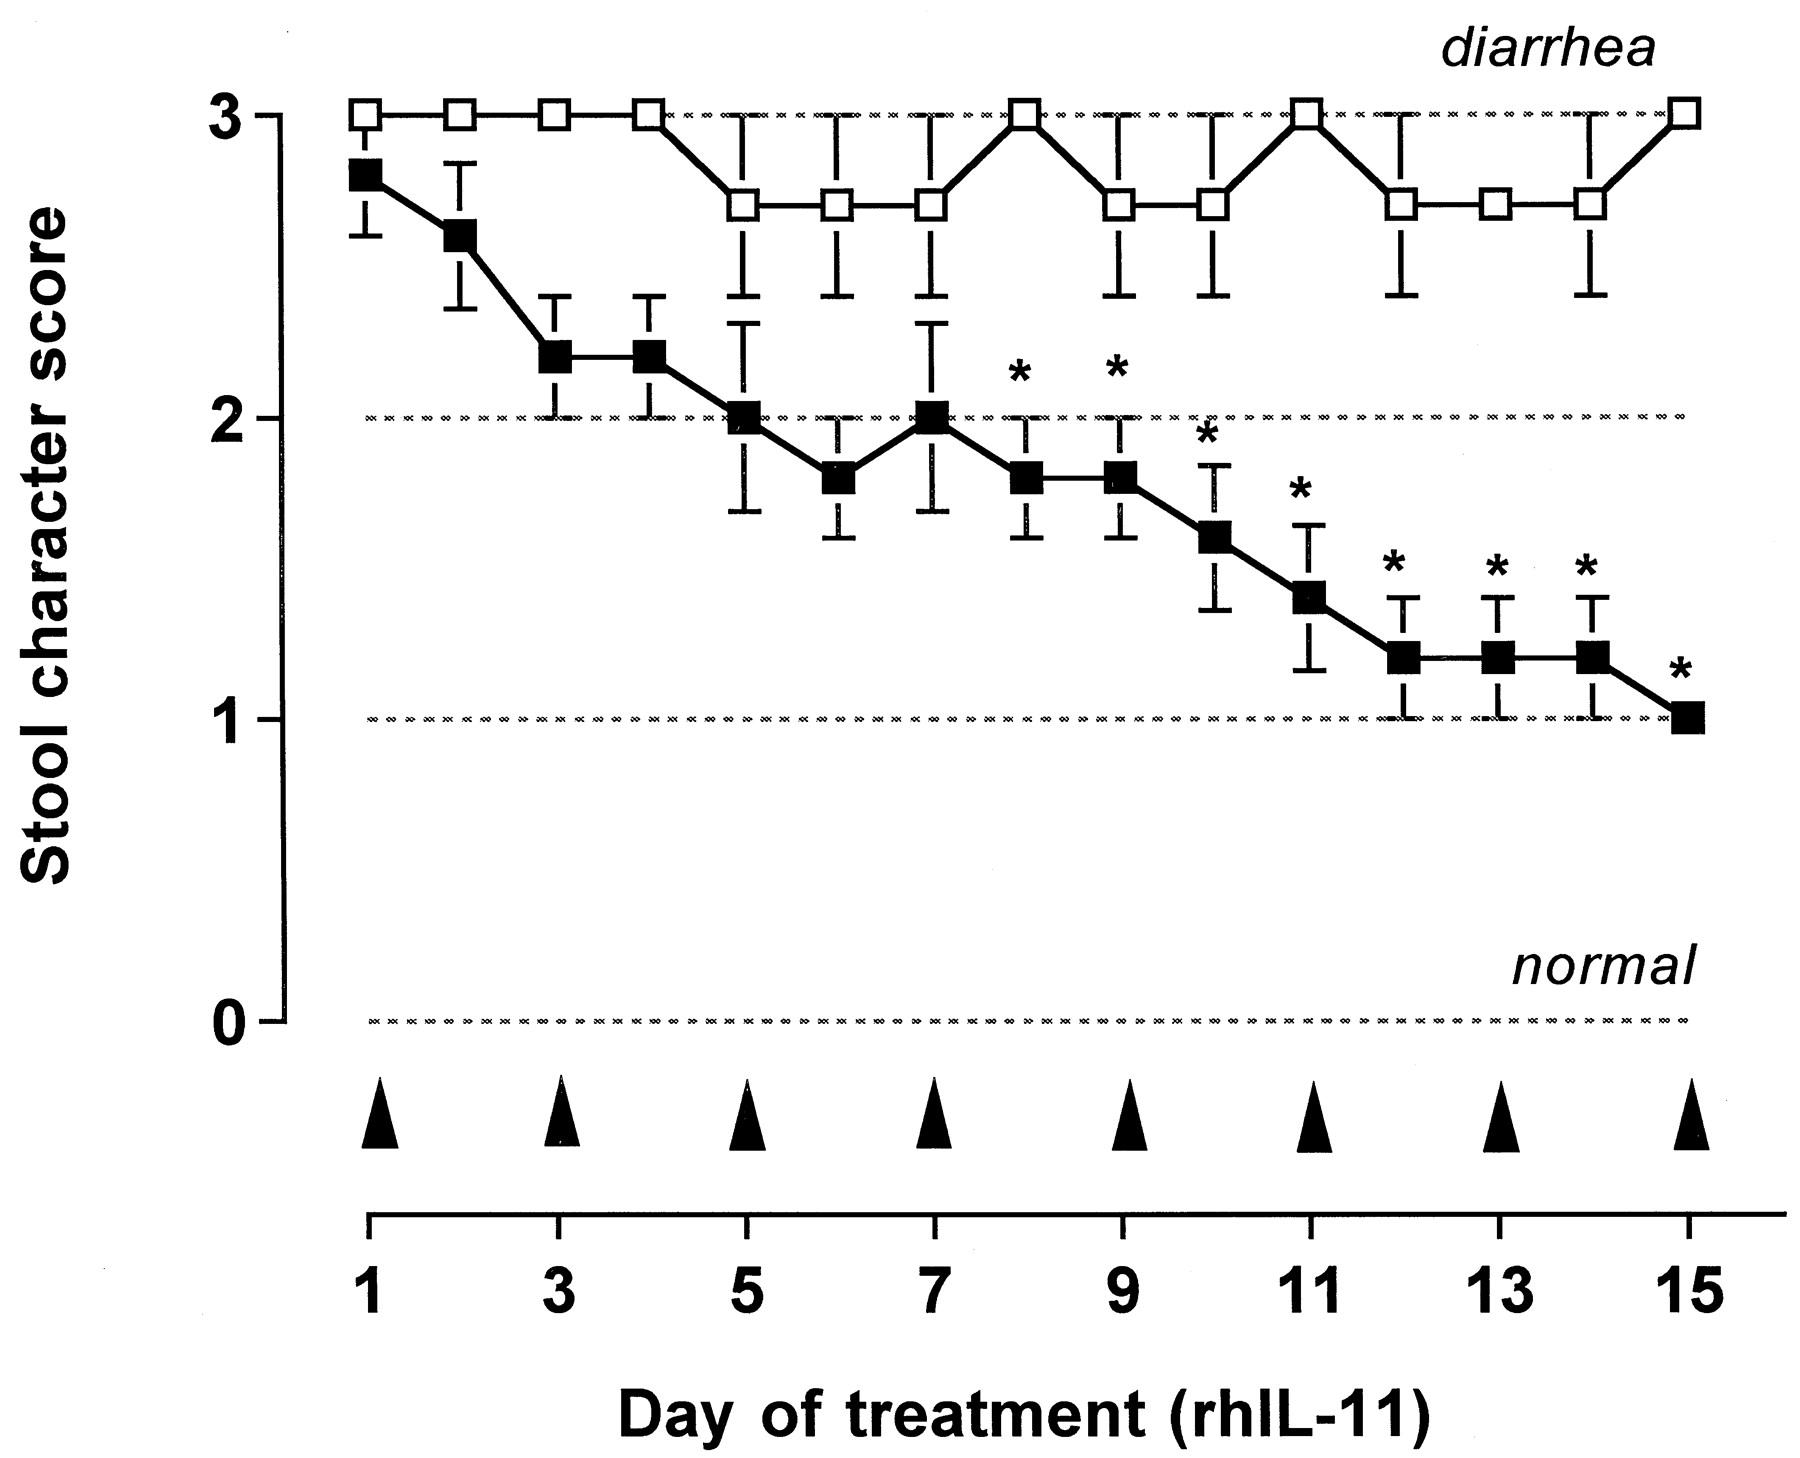 Recombinant Human Interleukin-11 Restores Smooth Muscle